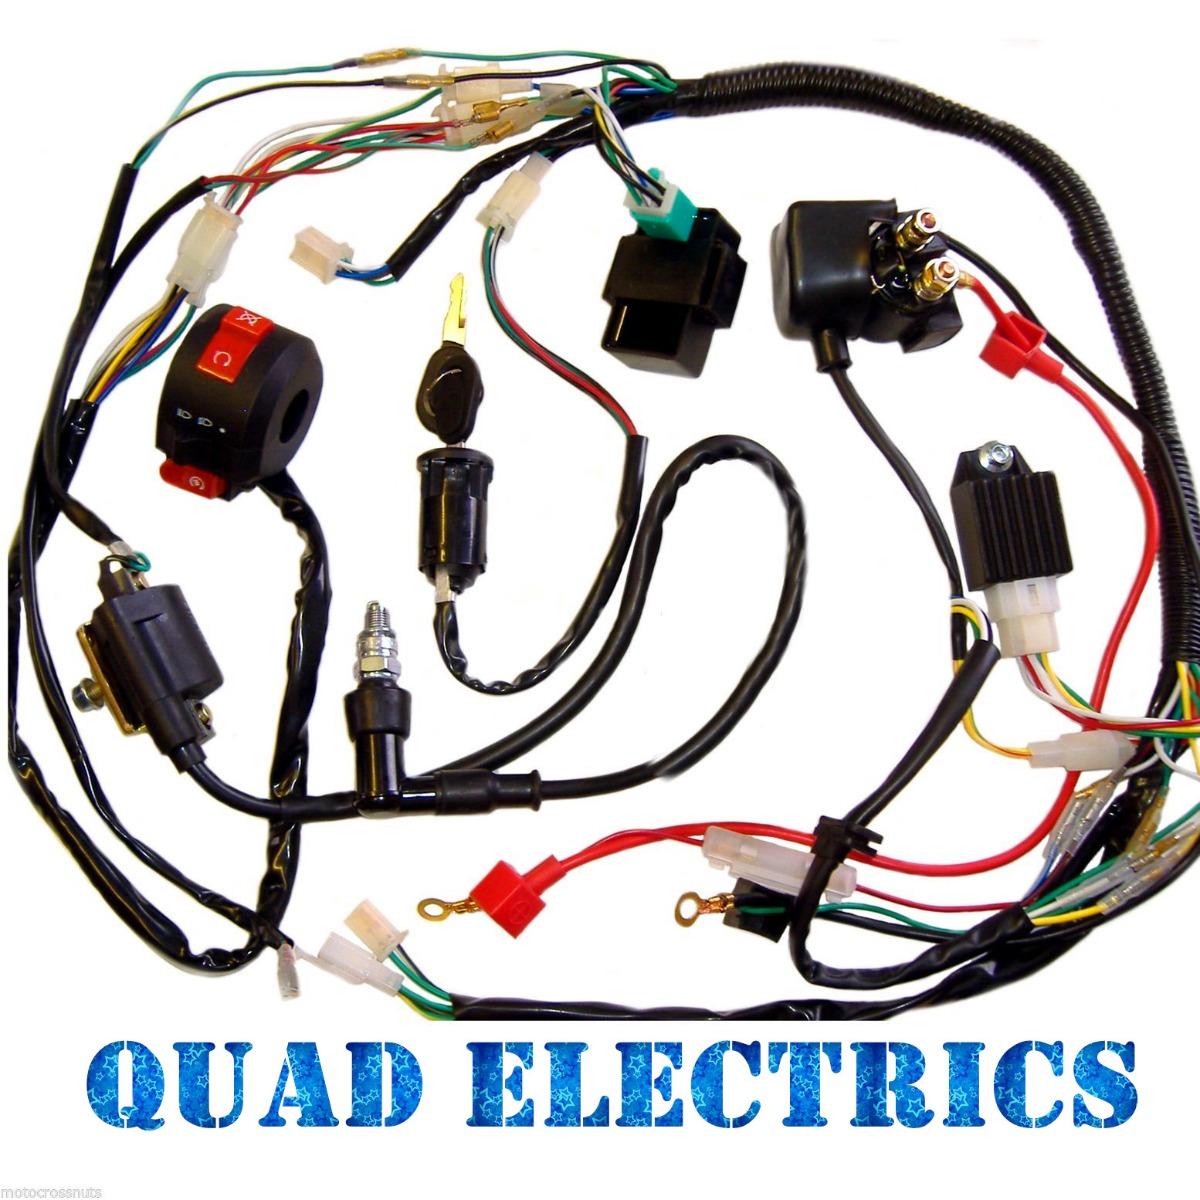 110cc chinese quad bike wiring diagram 6 prong trailer plug harness cdi coil kill key switch 50cc 125cc